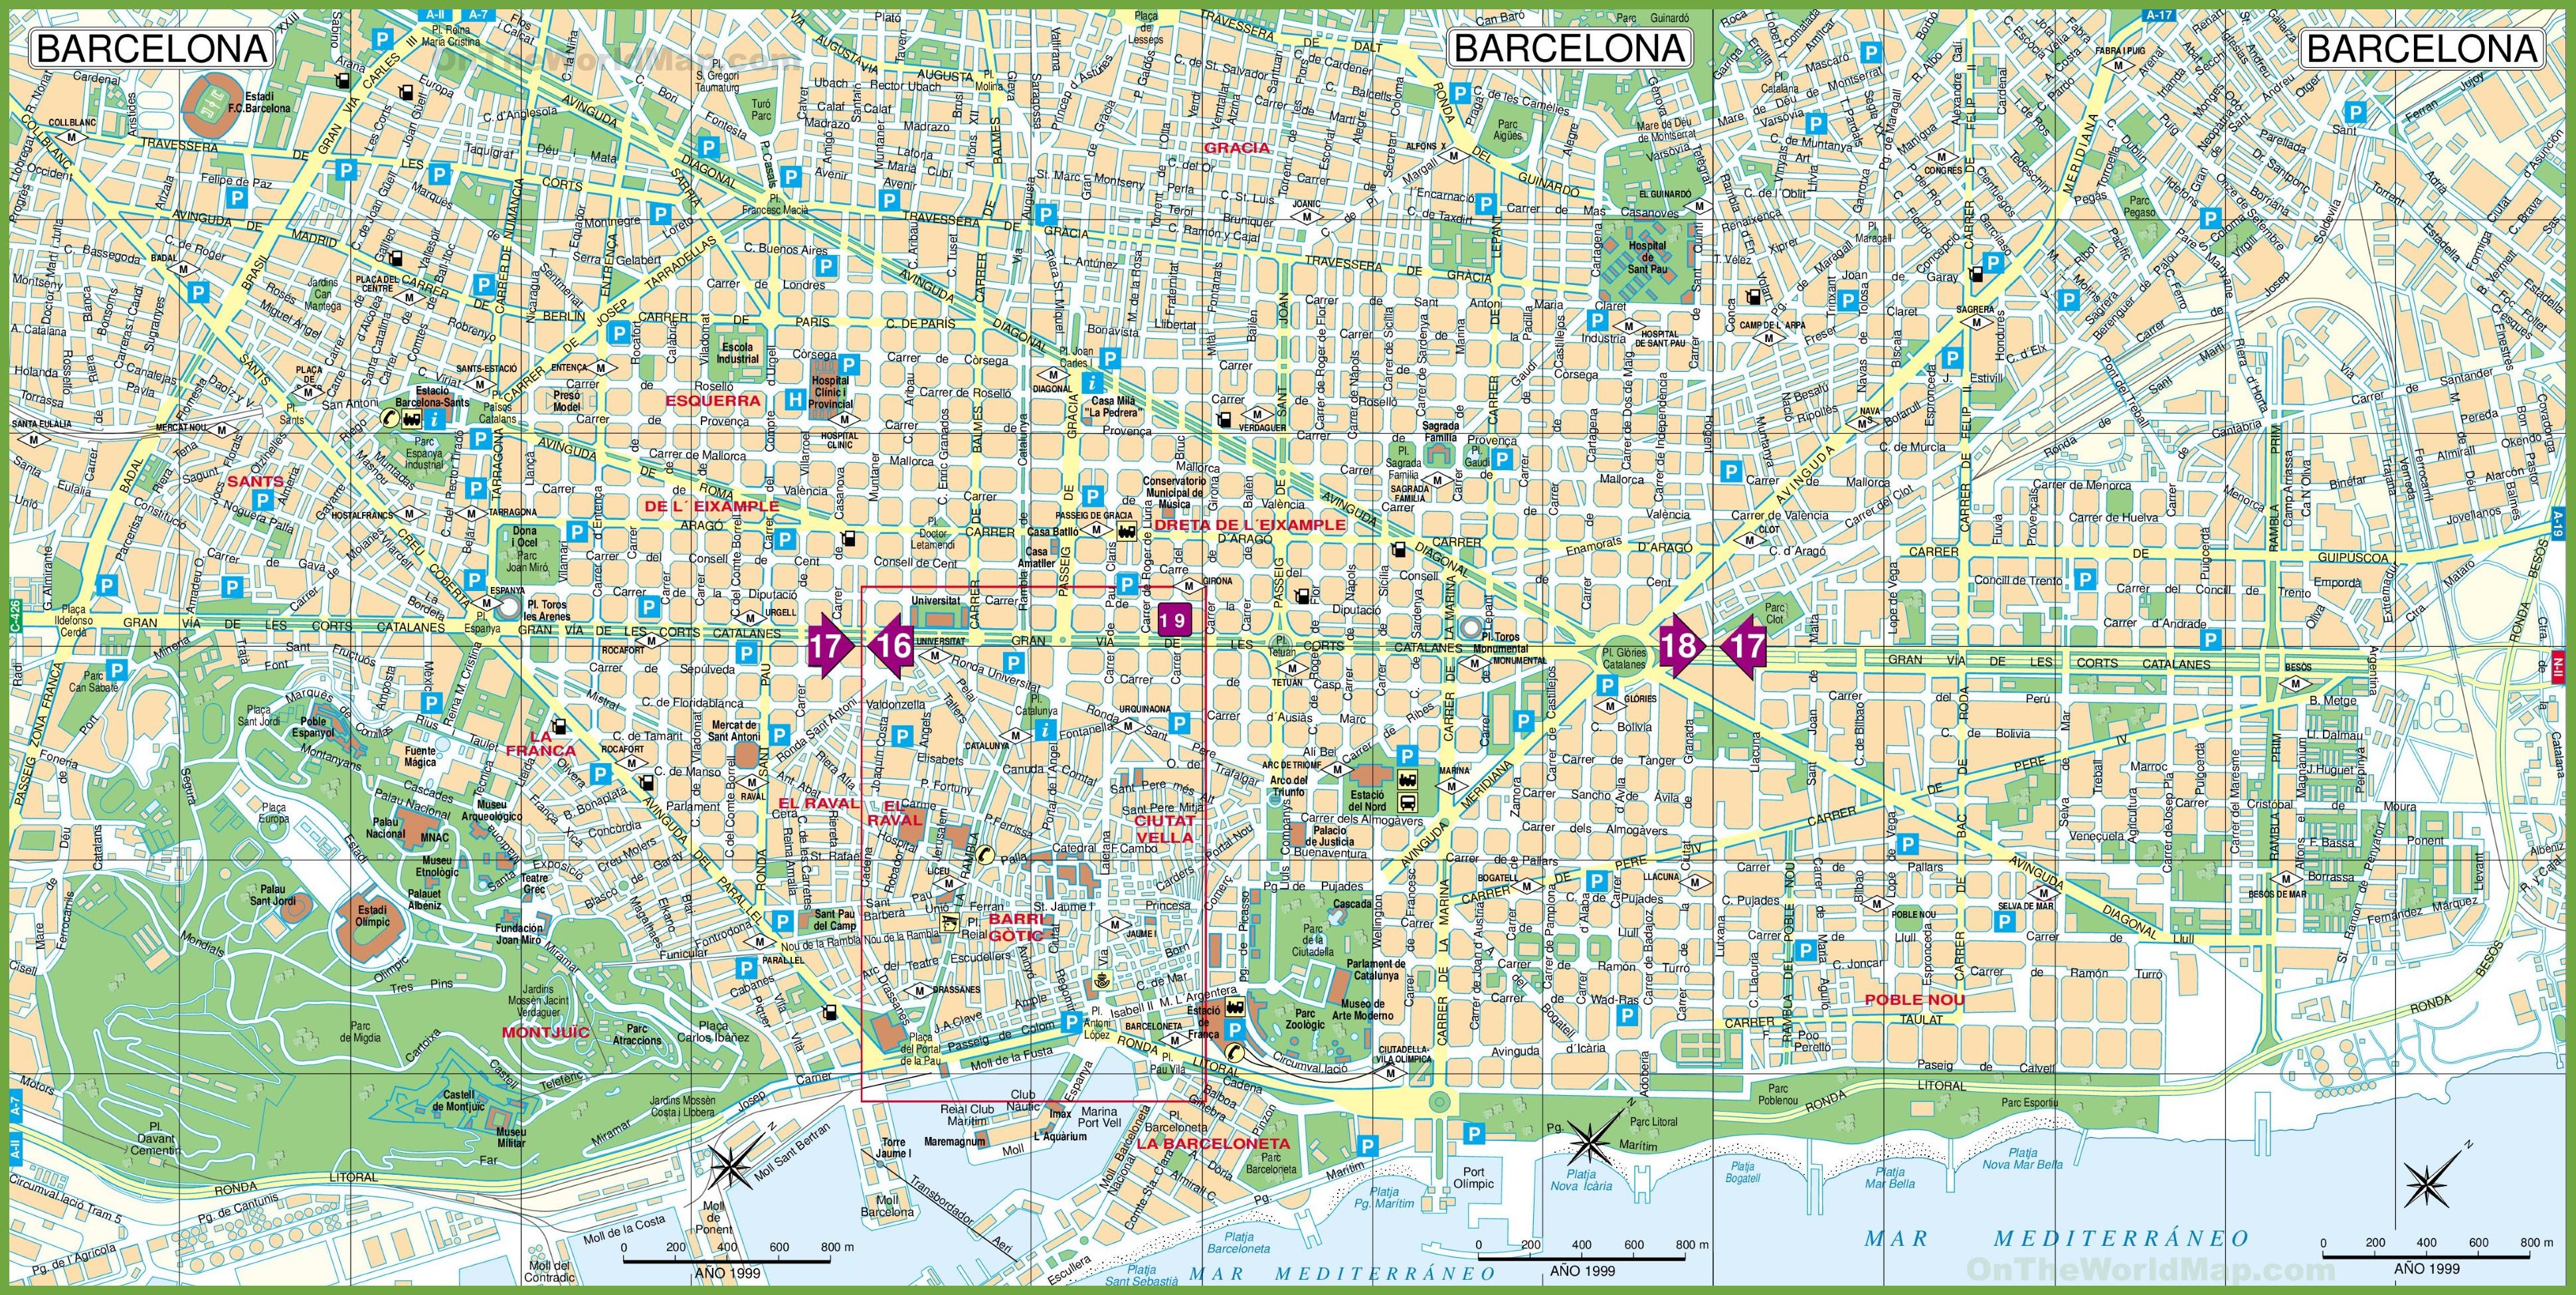 Barcelona Maps - Barcelona info